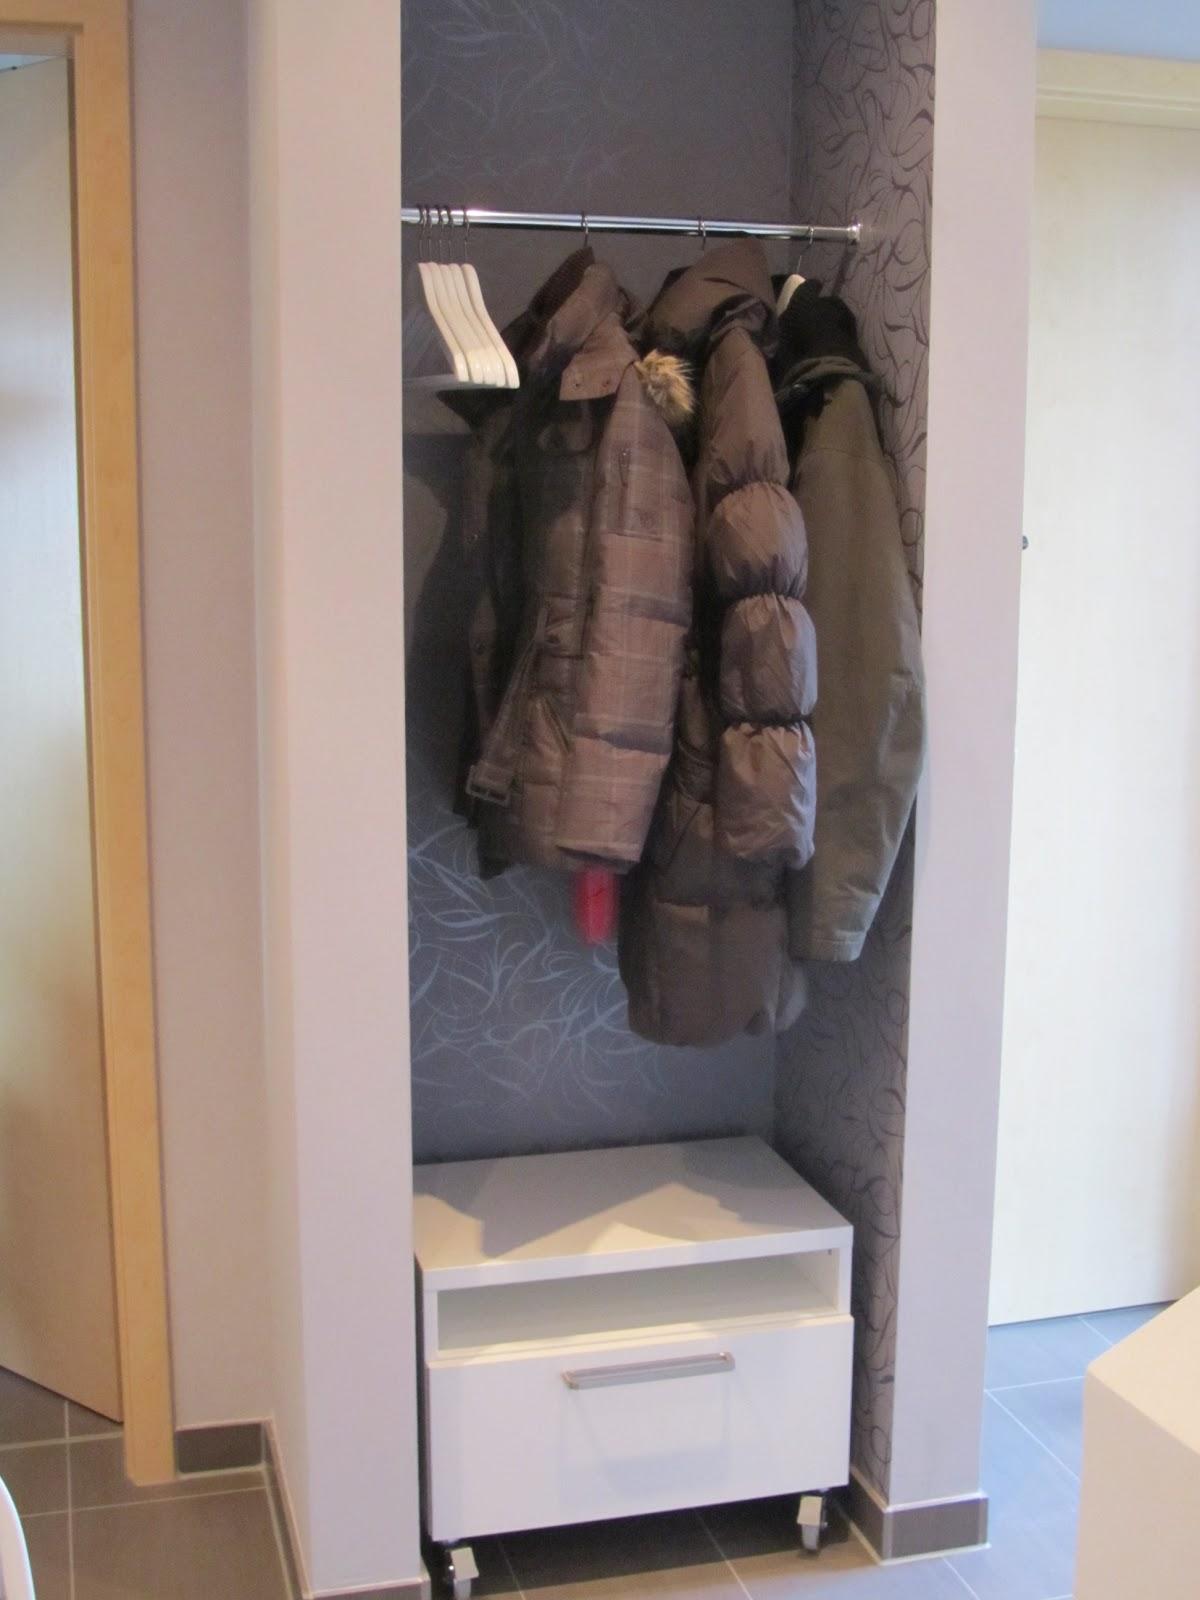 hausbau bei den flederm usen stolz wie oskar. Black Bedroom Furniture Sets. Home Design Ideas